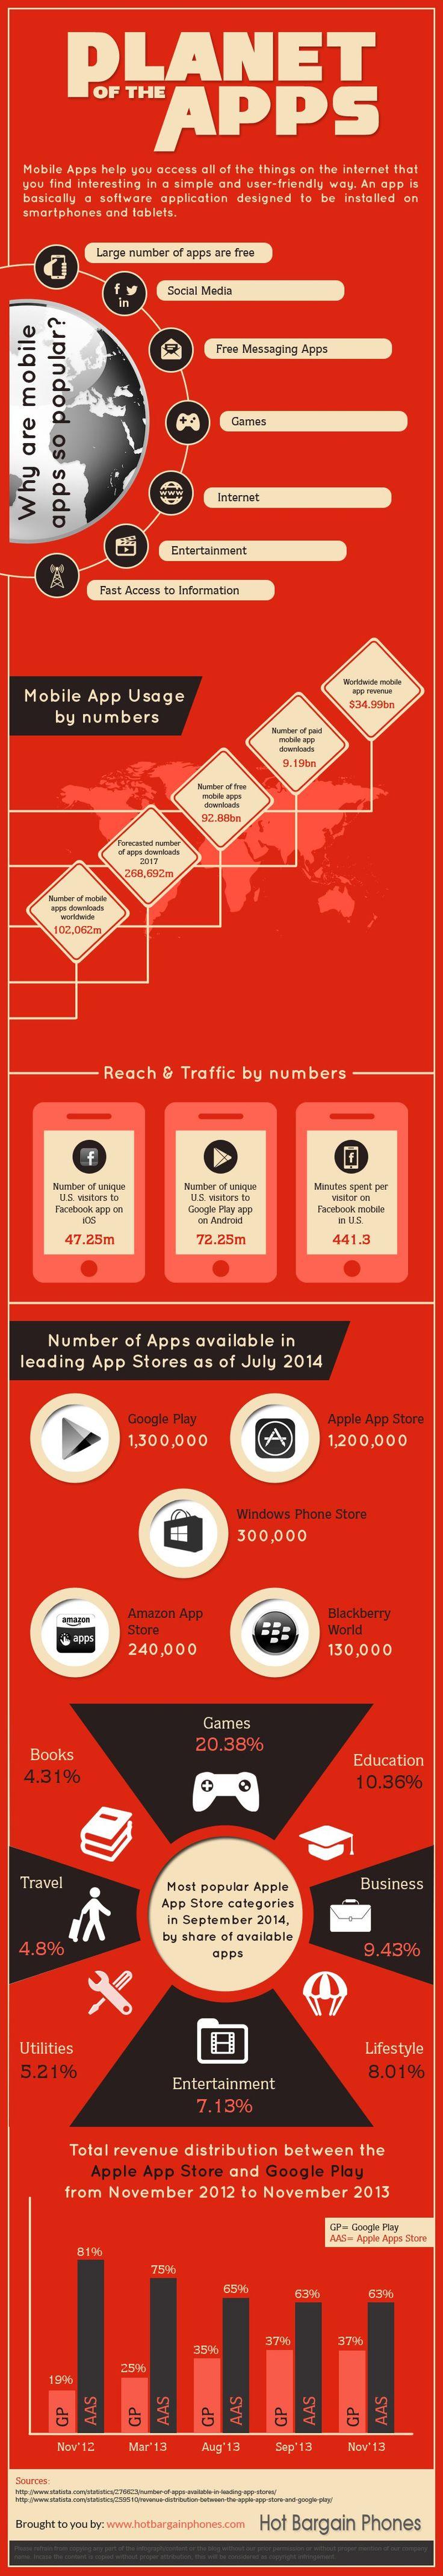 Planet of the apps | hotbargainsphone.com | Dec 2014